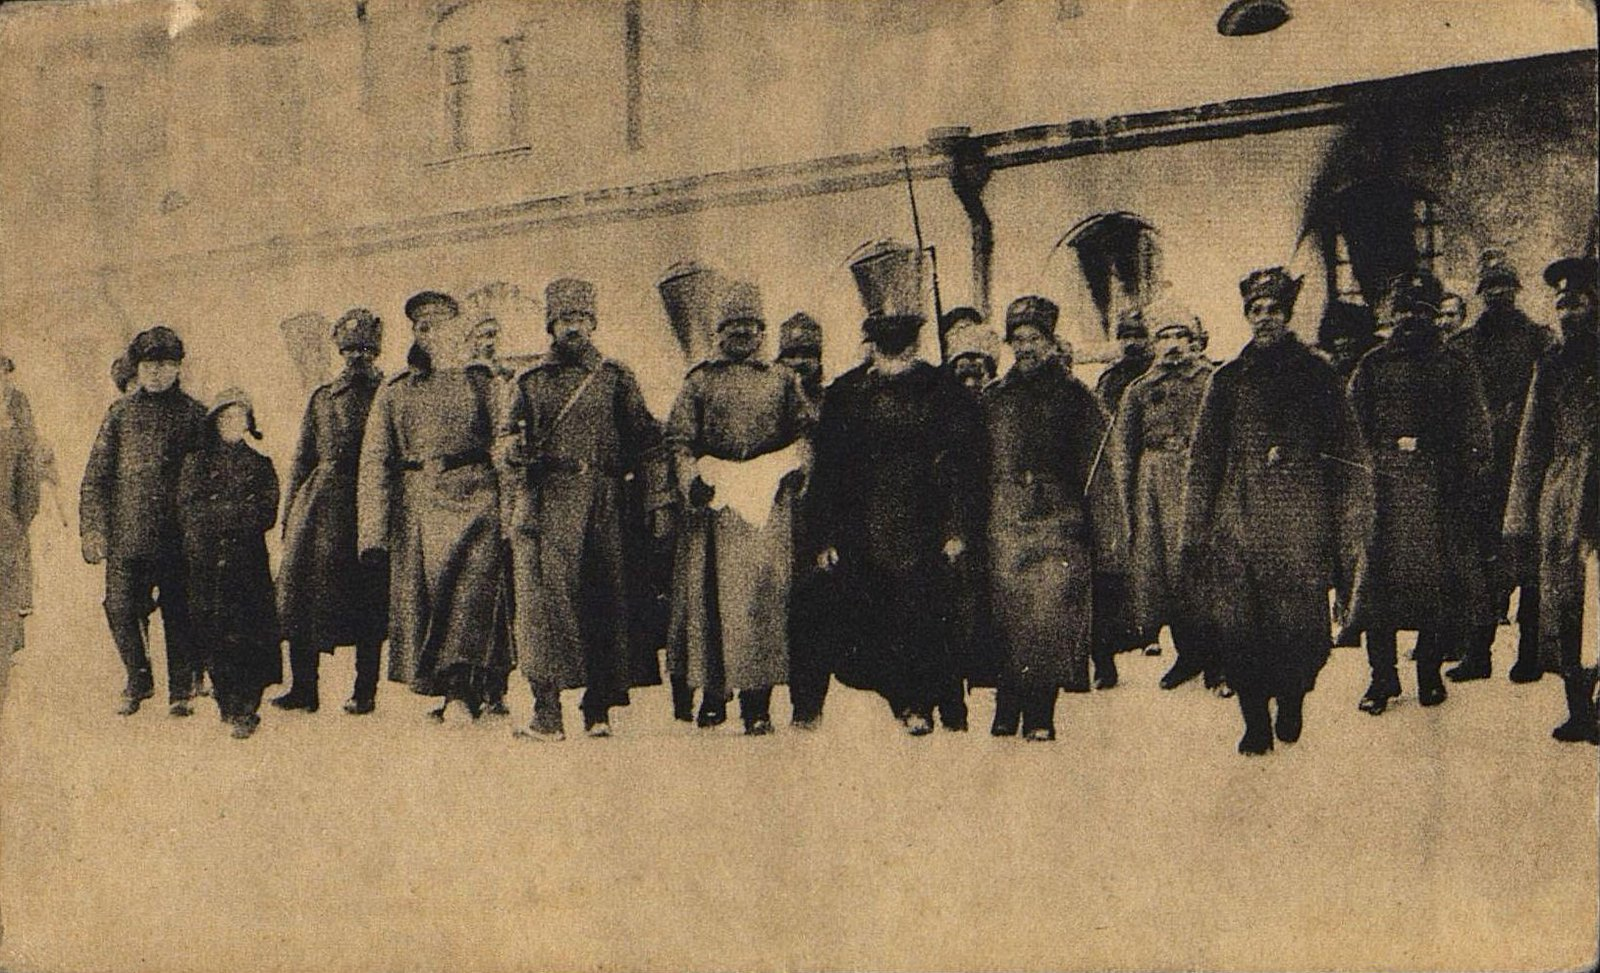 47. Дни революции в Петрограде. Арест полиции